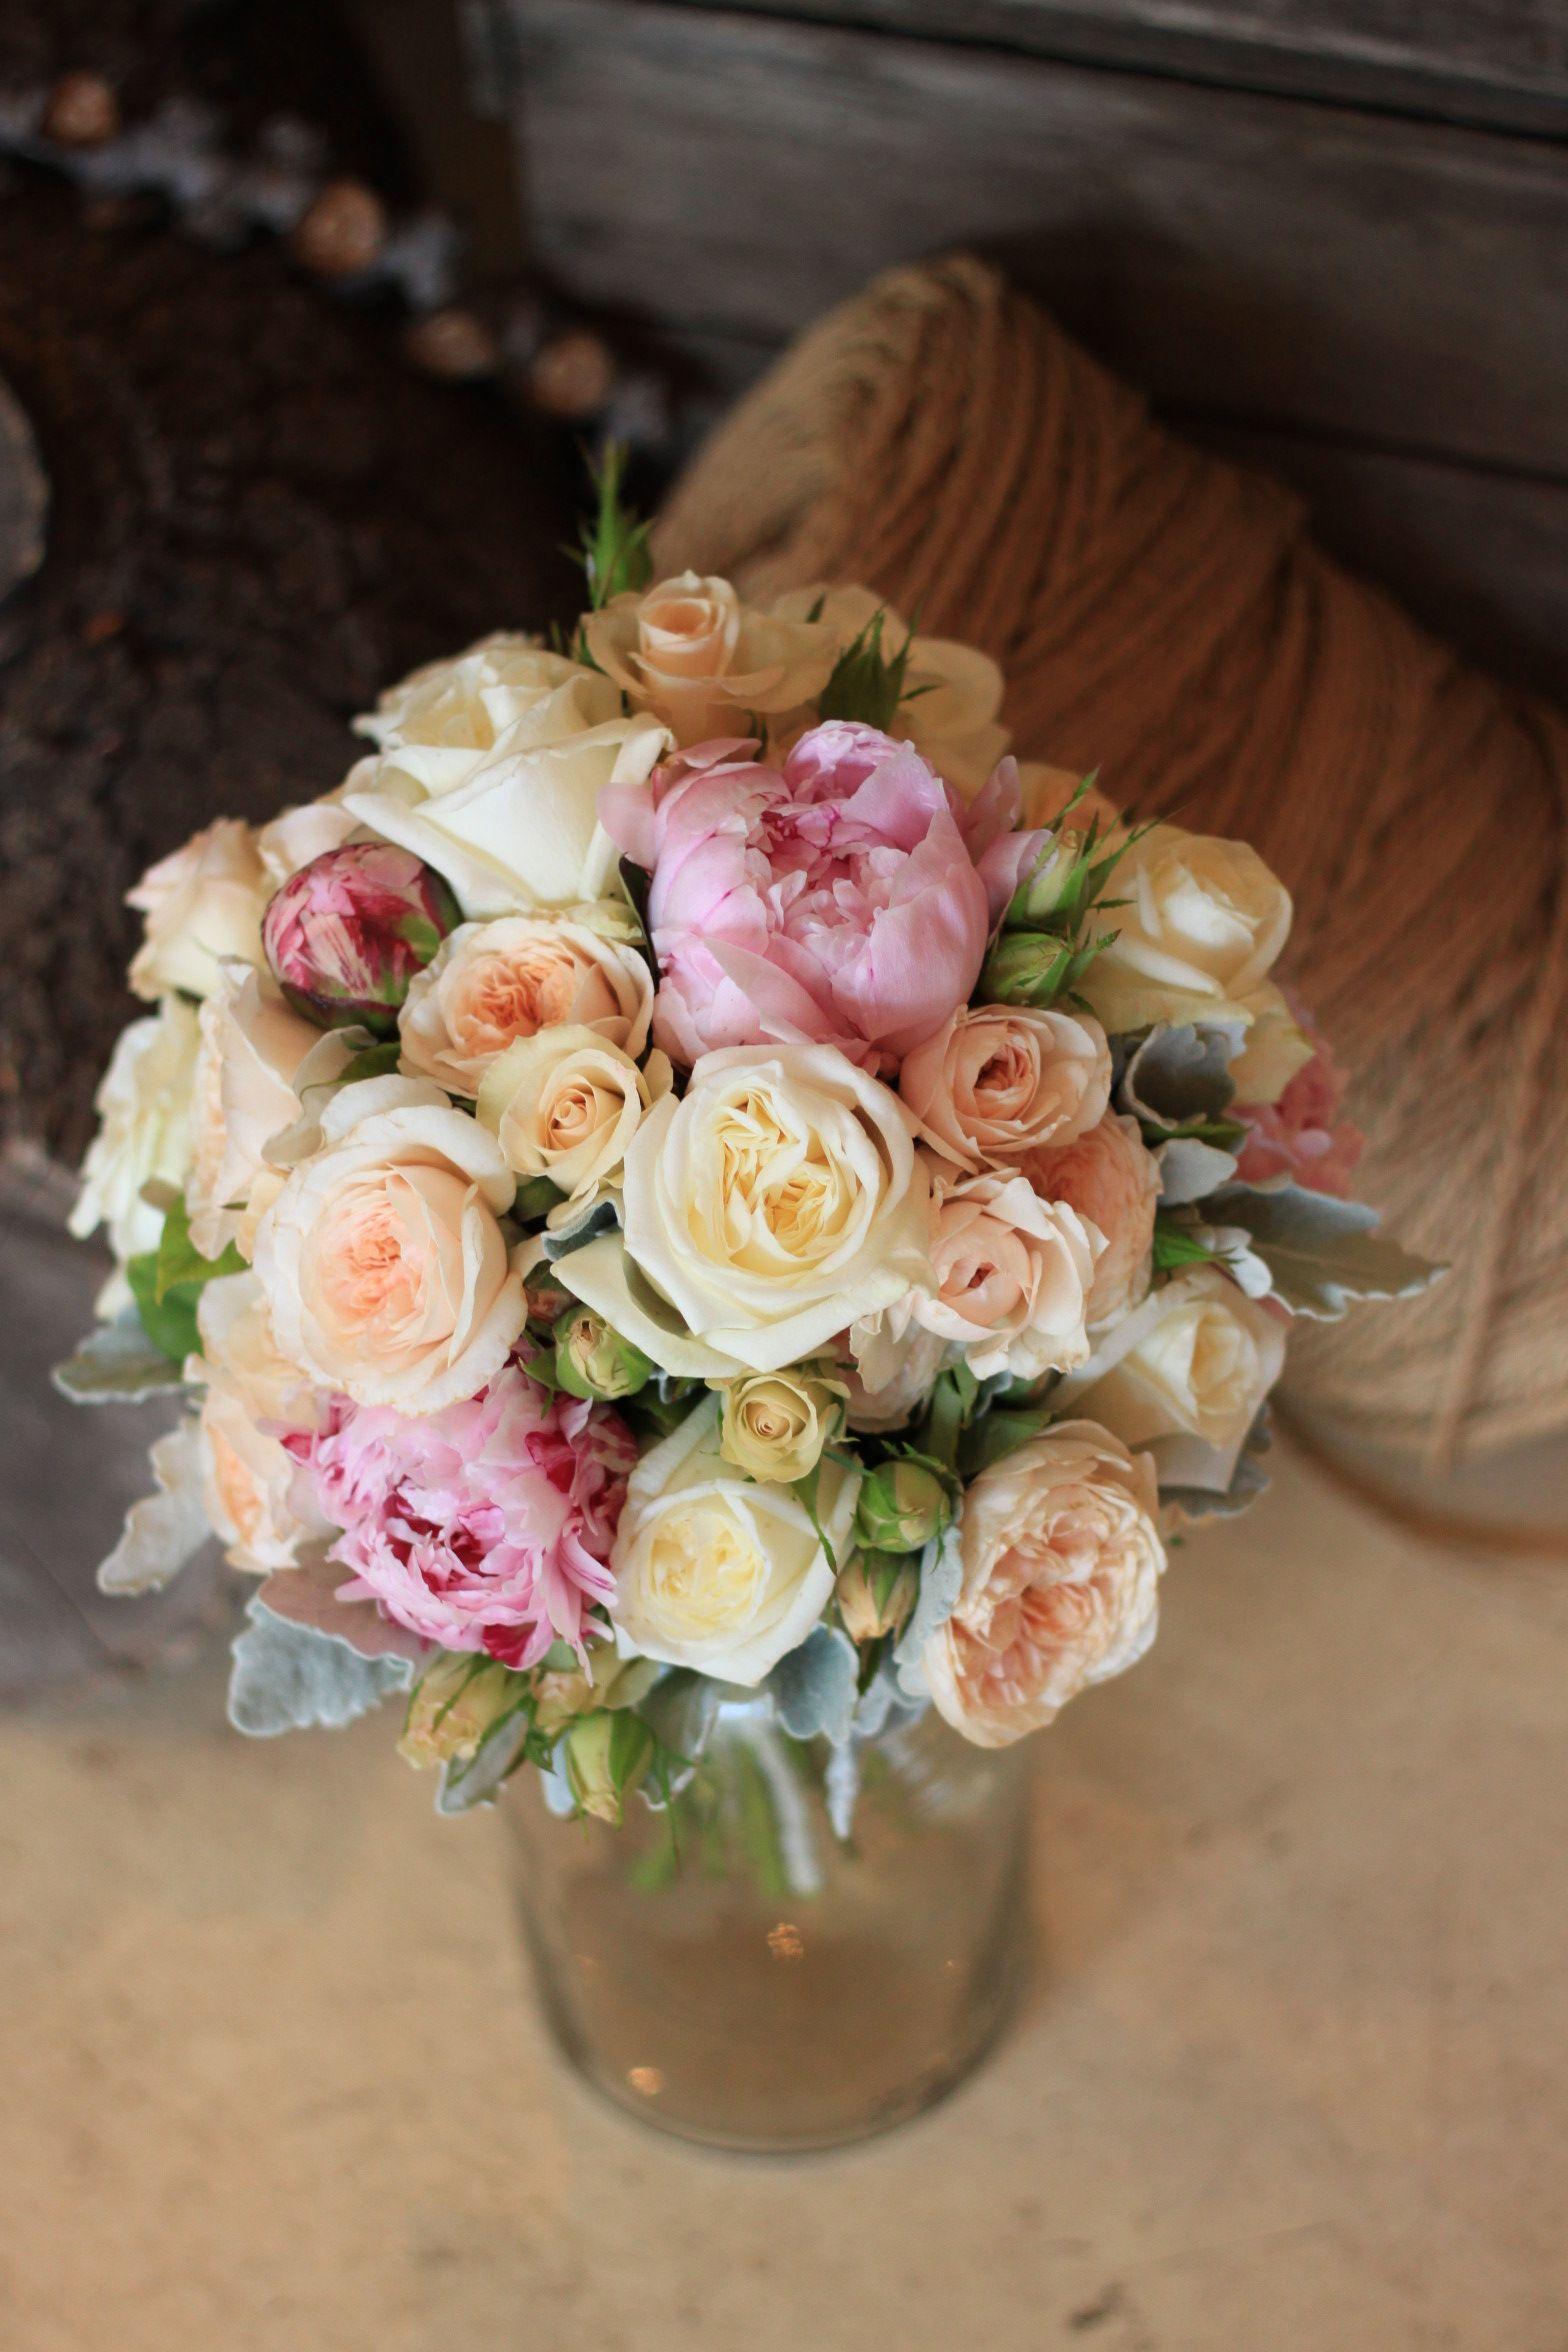 Vintage bouquet by flos florum malvern flosflorum vintage bouquet by flos florum malvern flosflorum izmirmasajfo